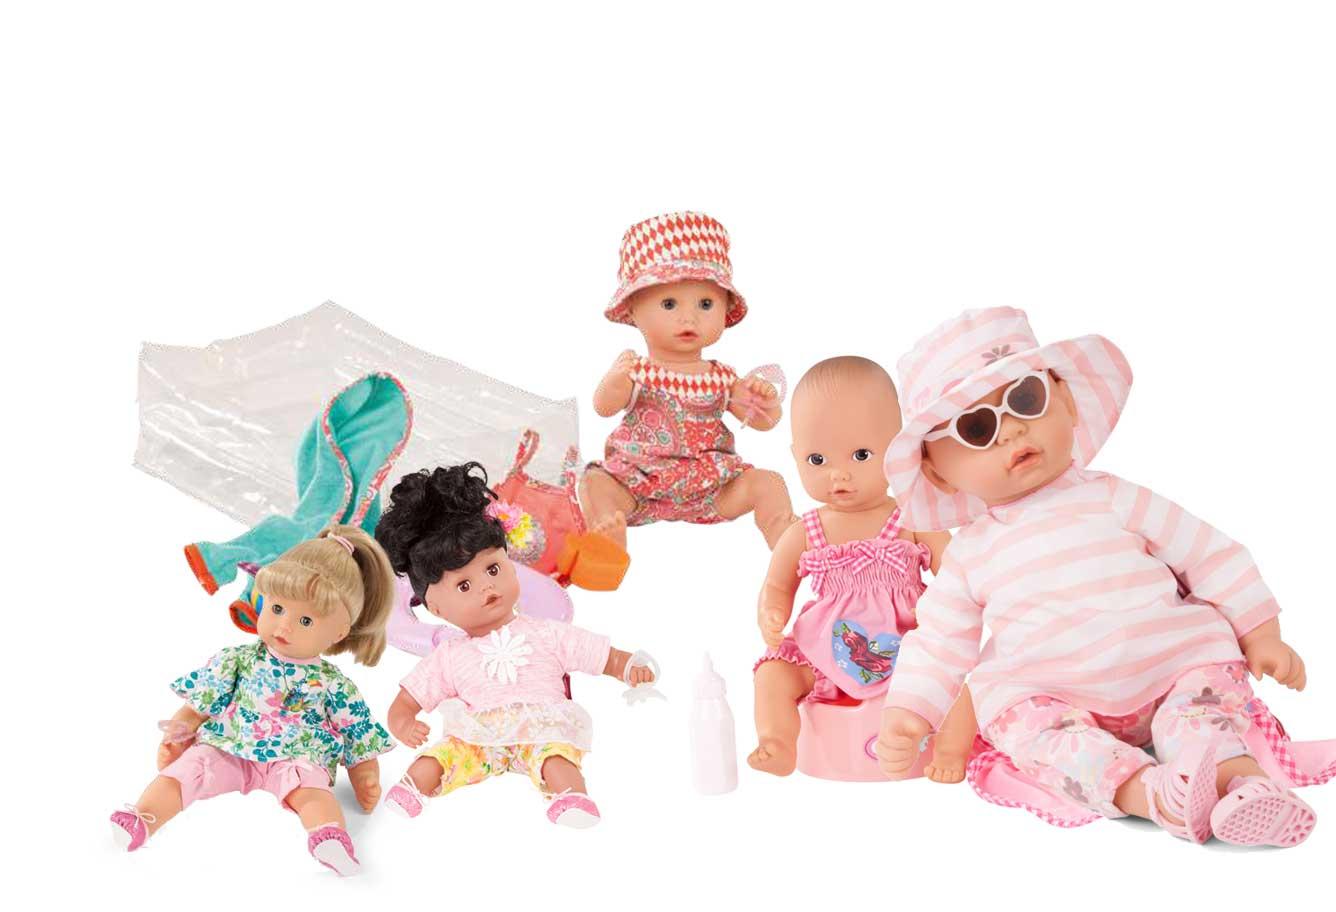 Baby & Toddler Dolls